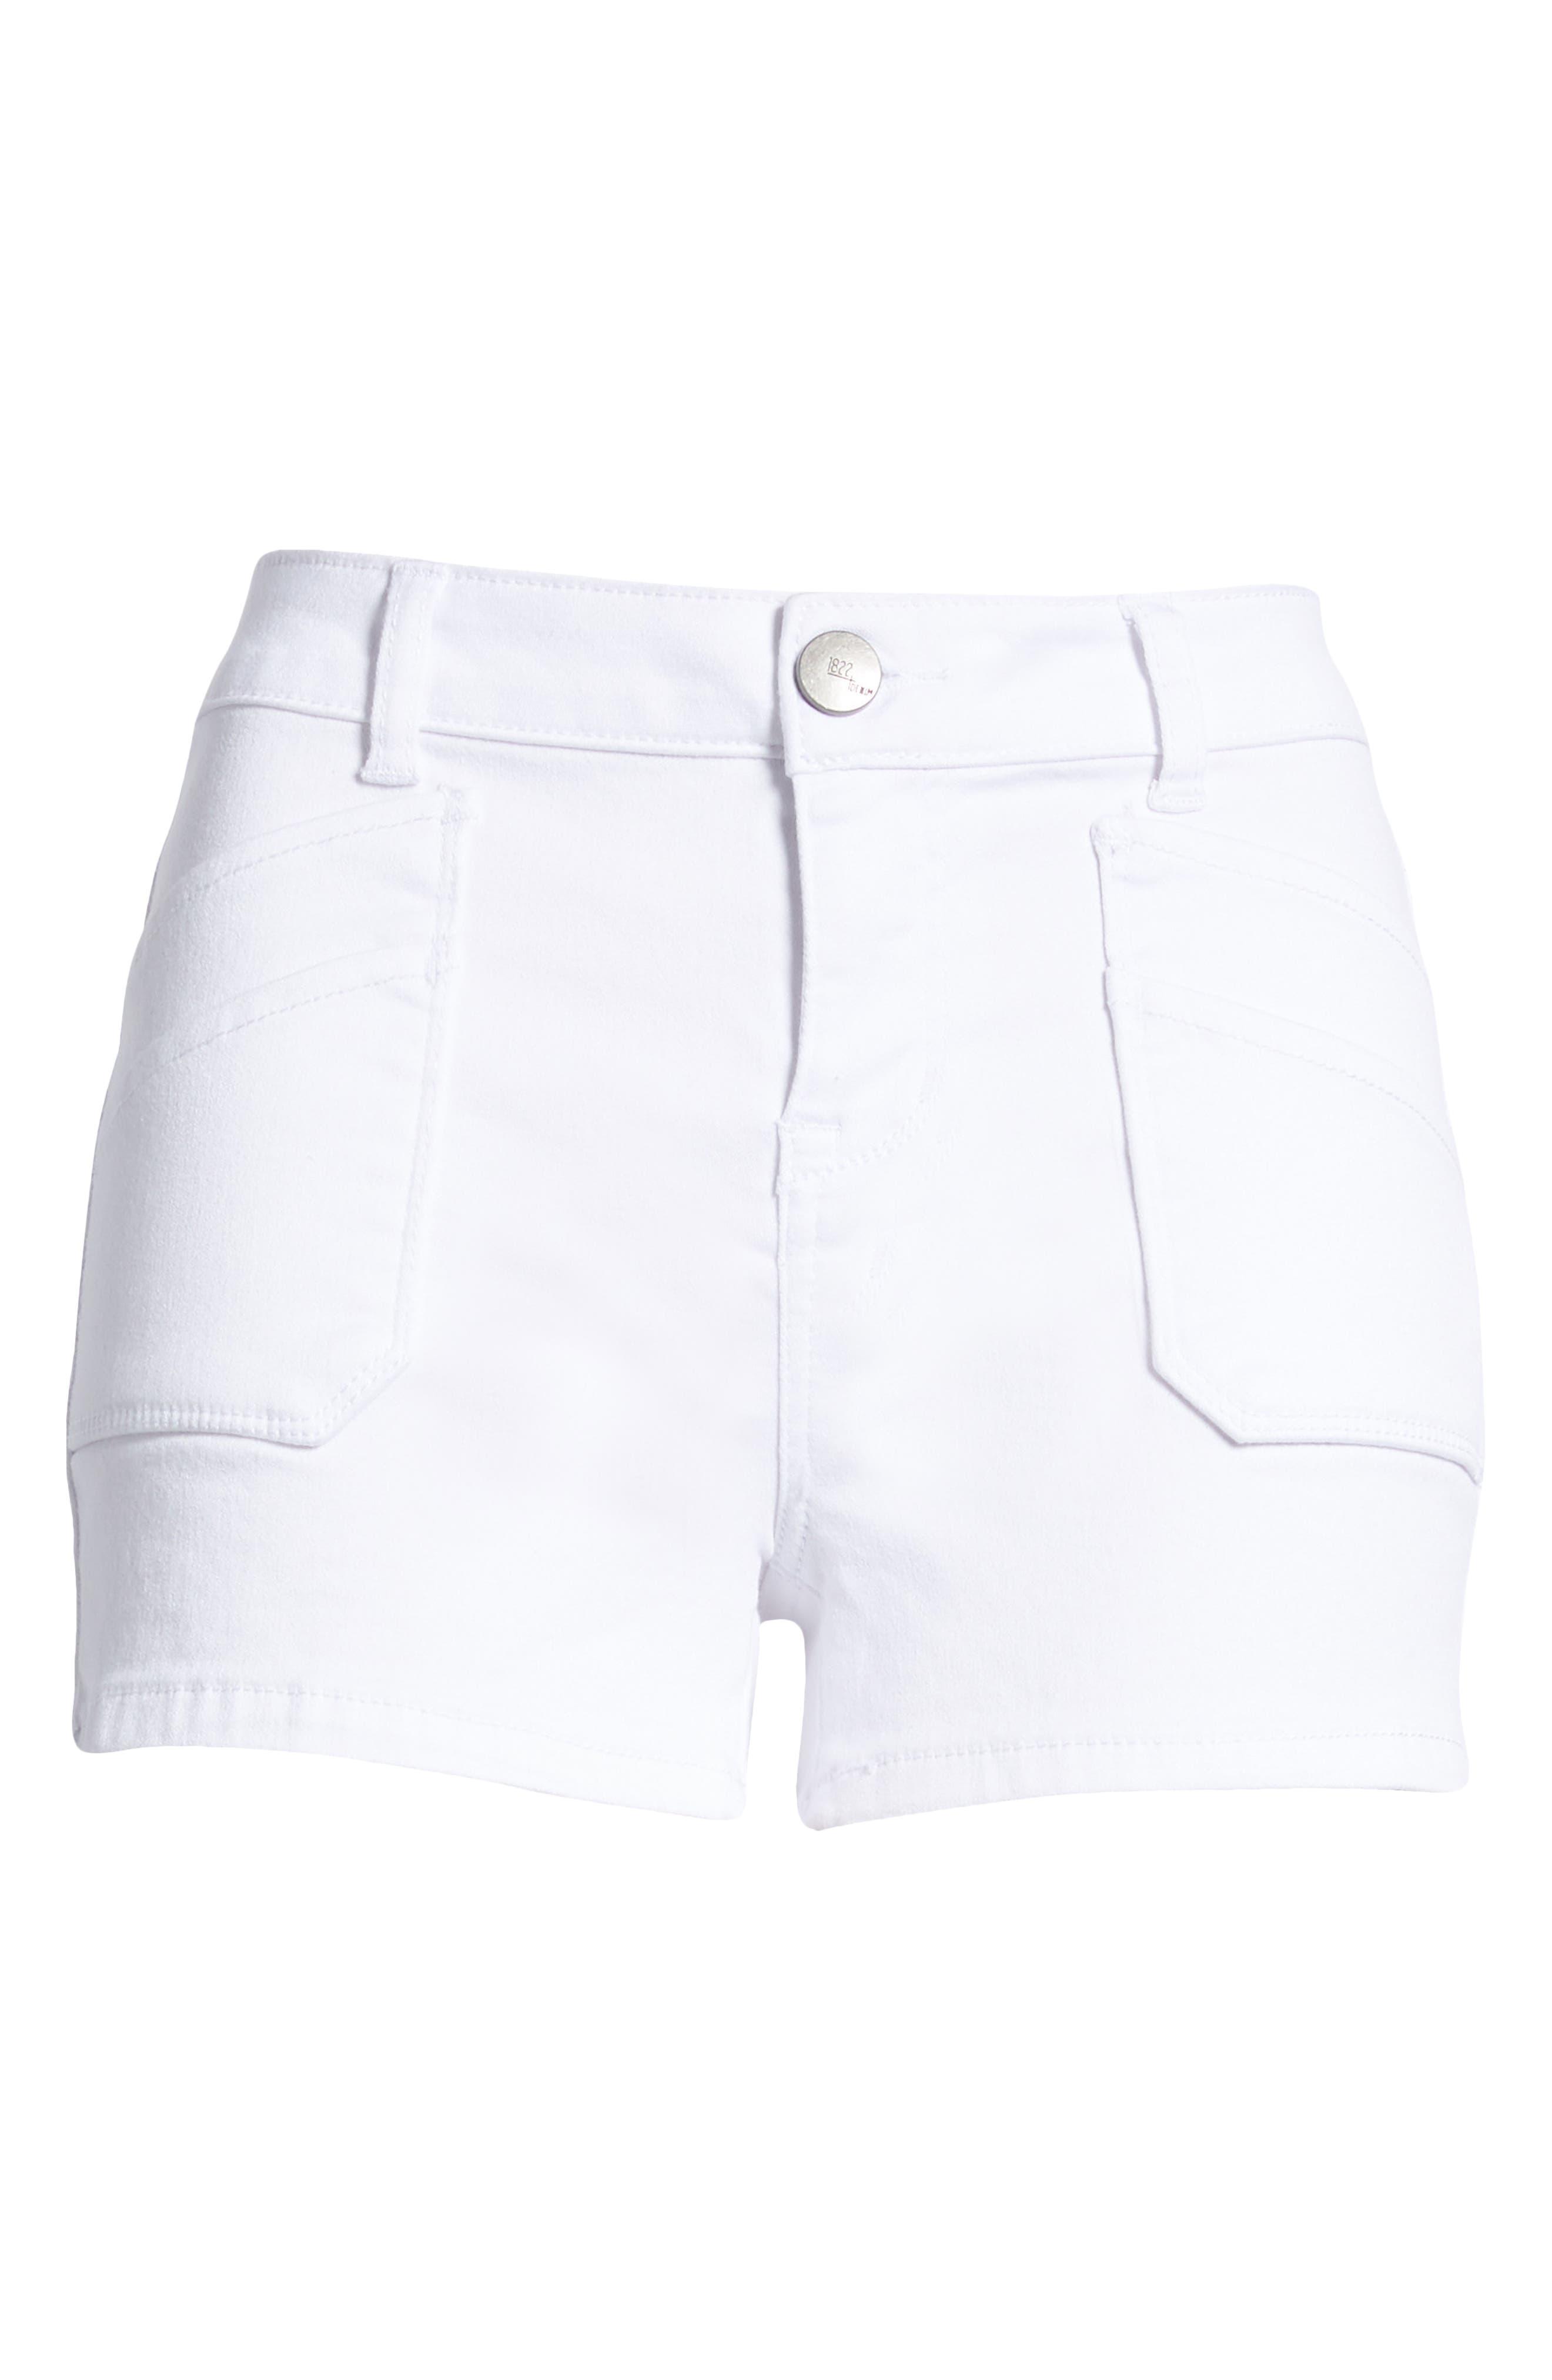 Hommes Sous-vêtements Boxer Shorts Ardennes Denim looked Trunks Slips Knickers